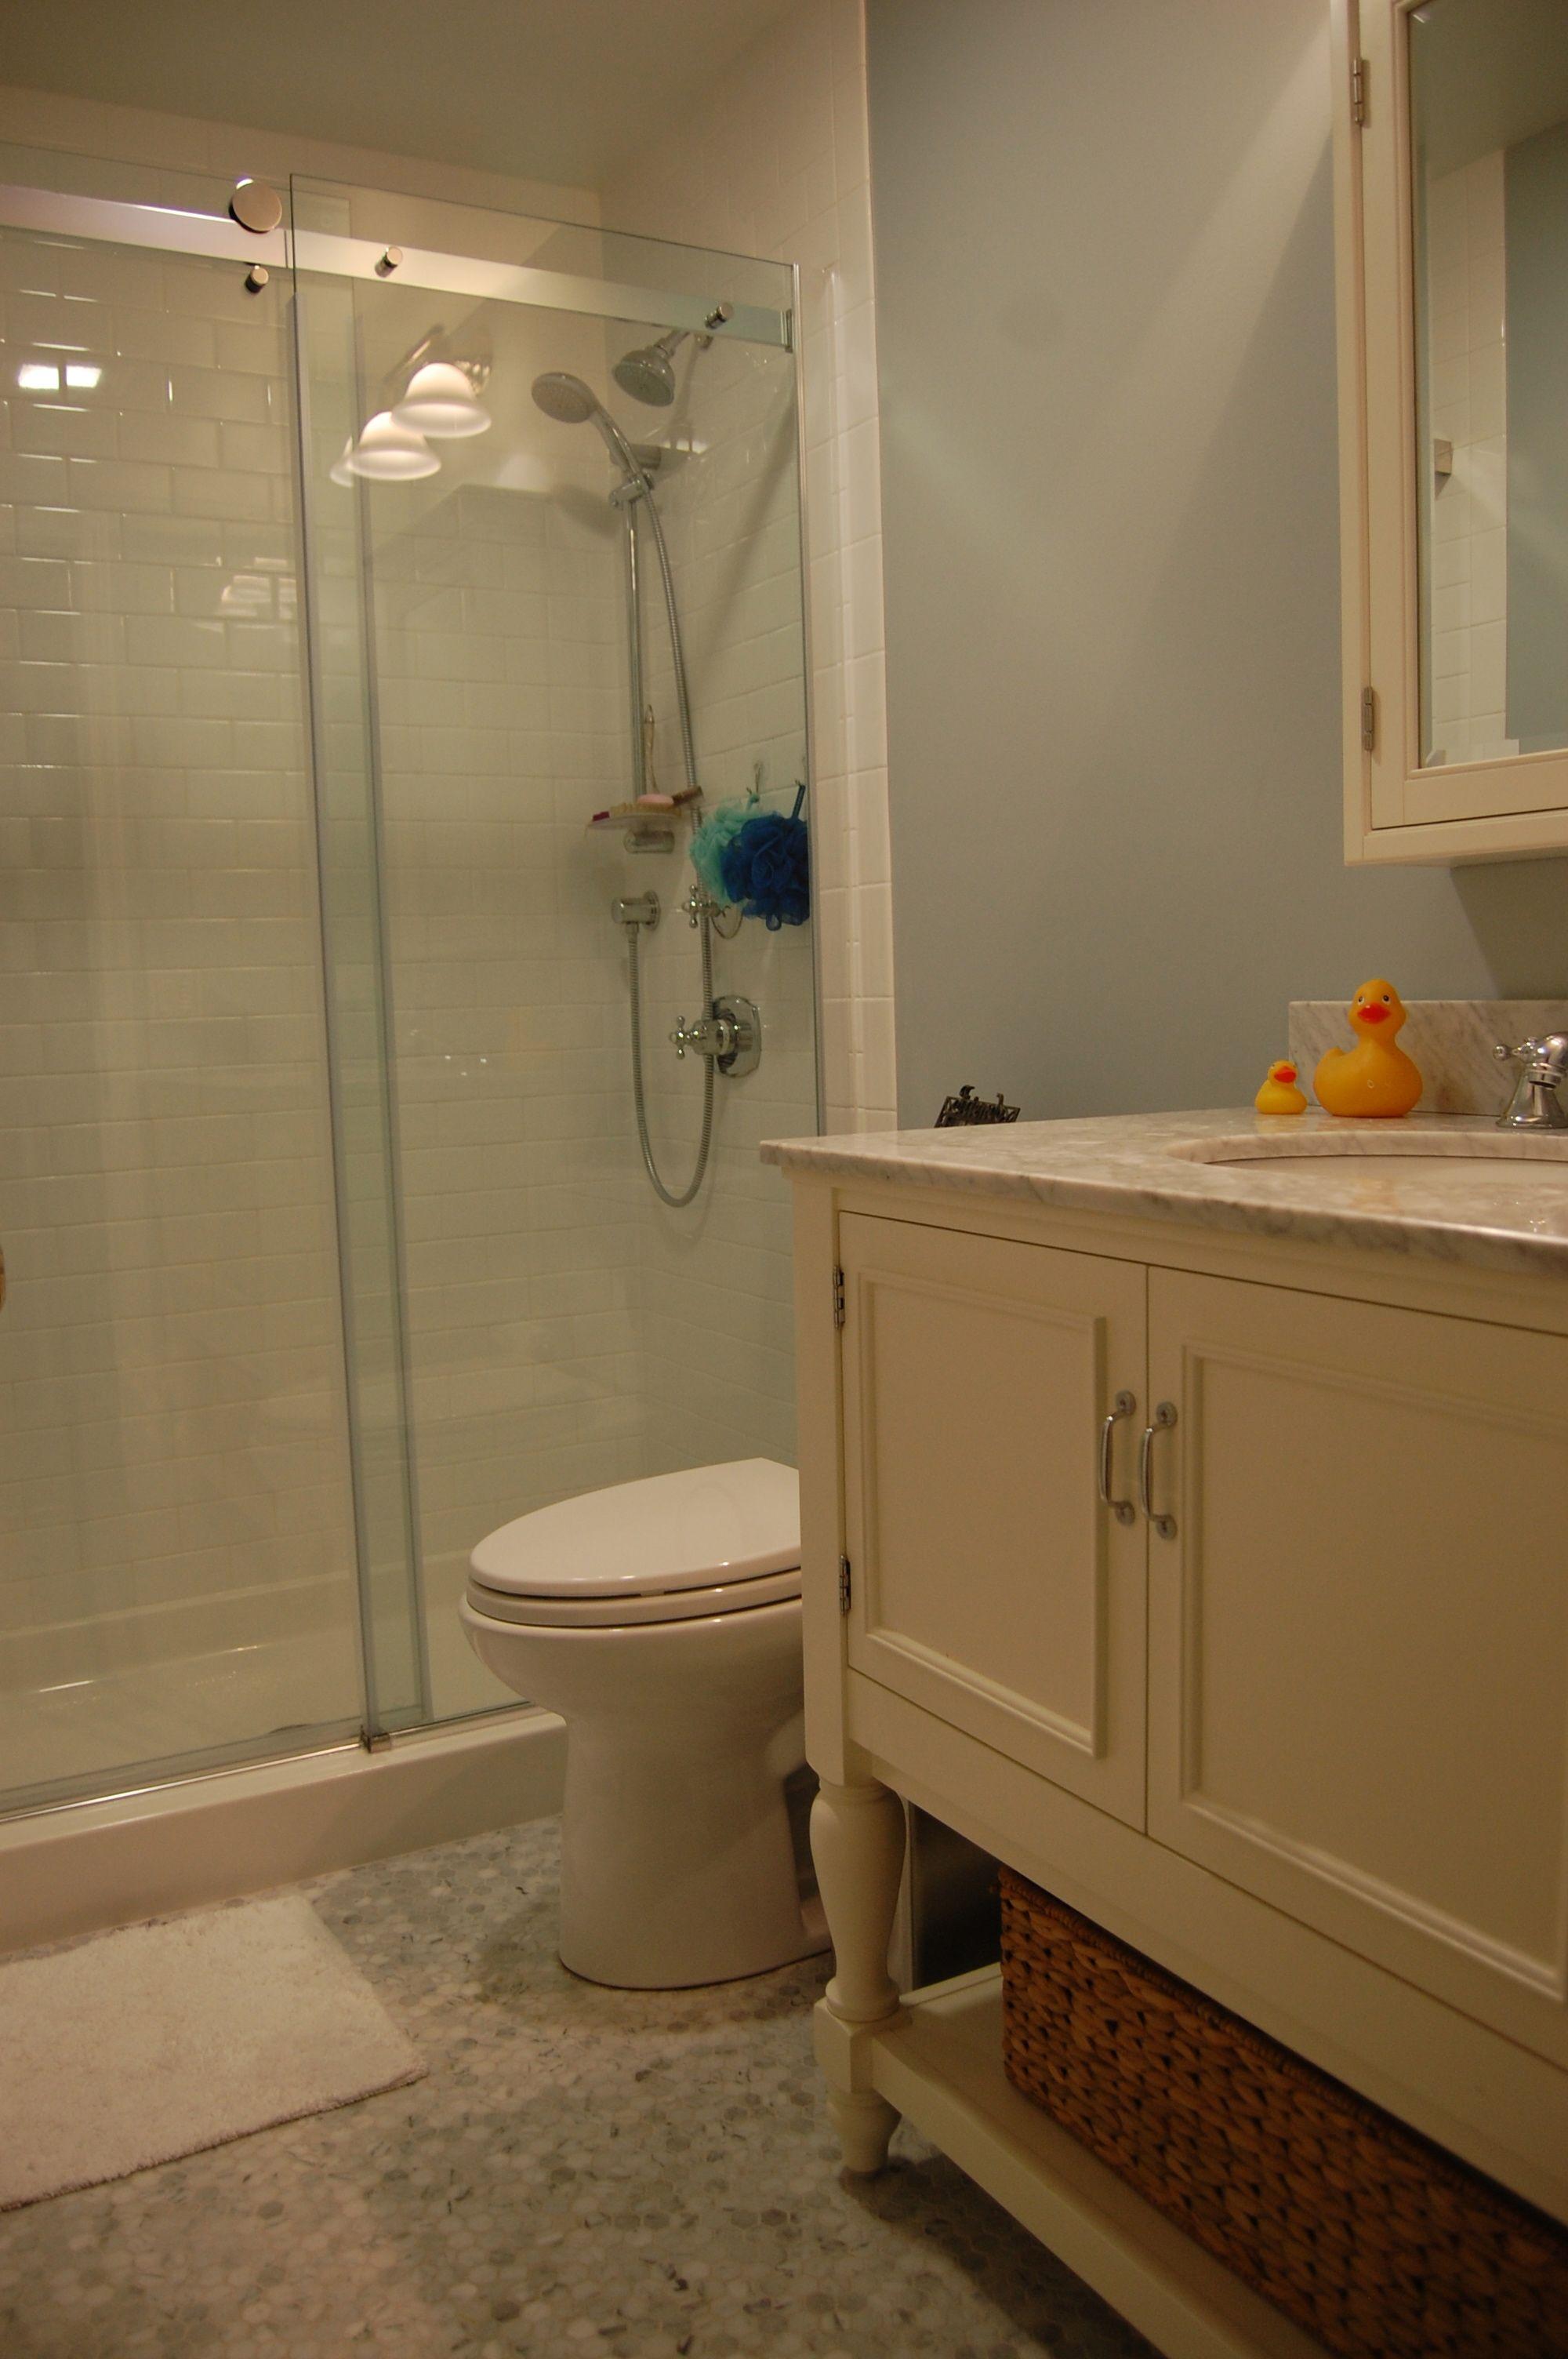 pottery barn vanity and medicine cabinet bathroom ideas pinterest